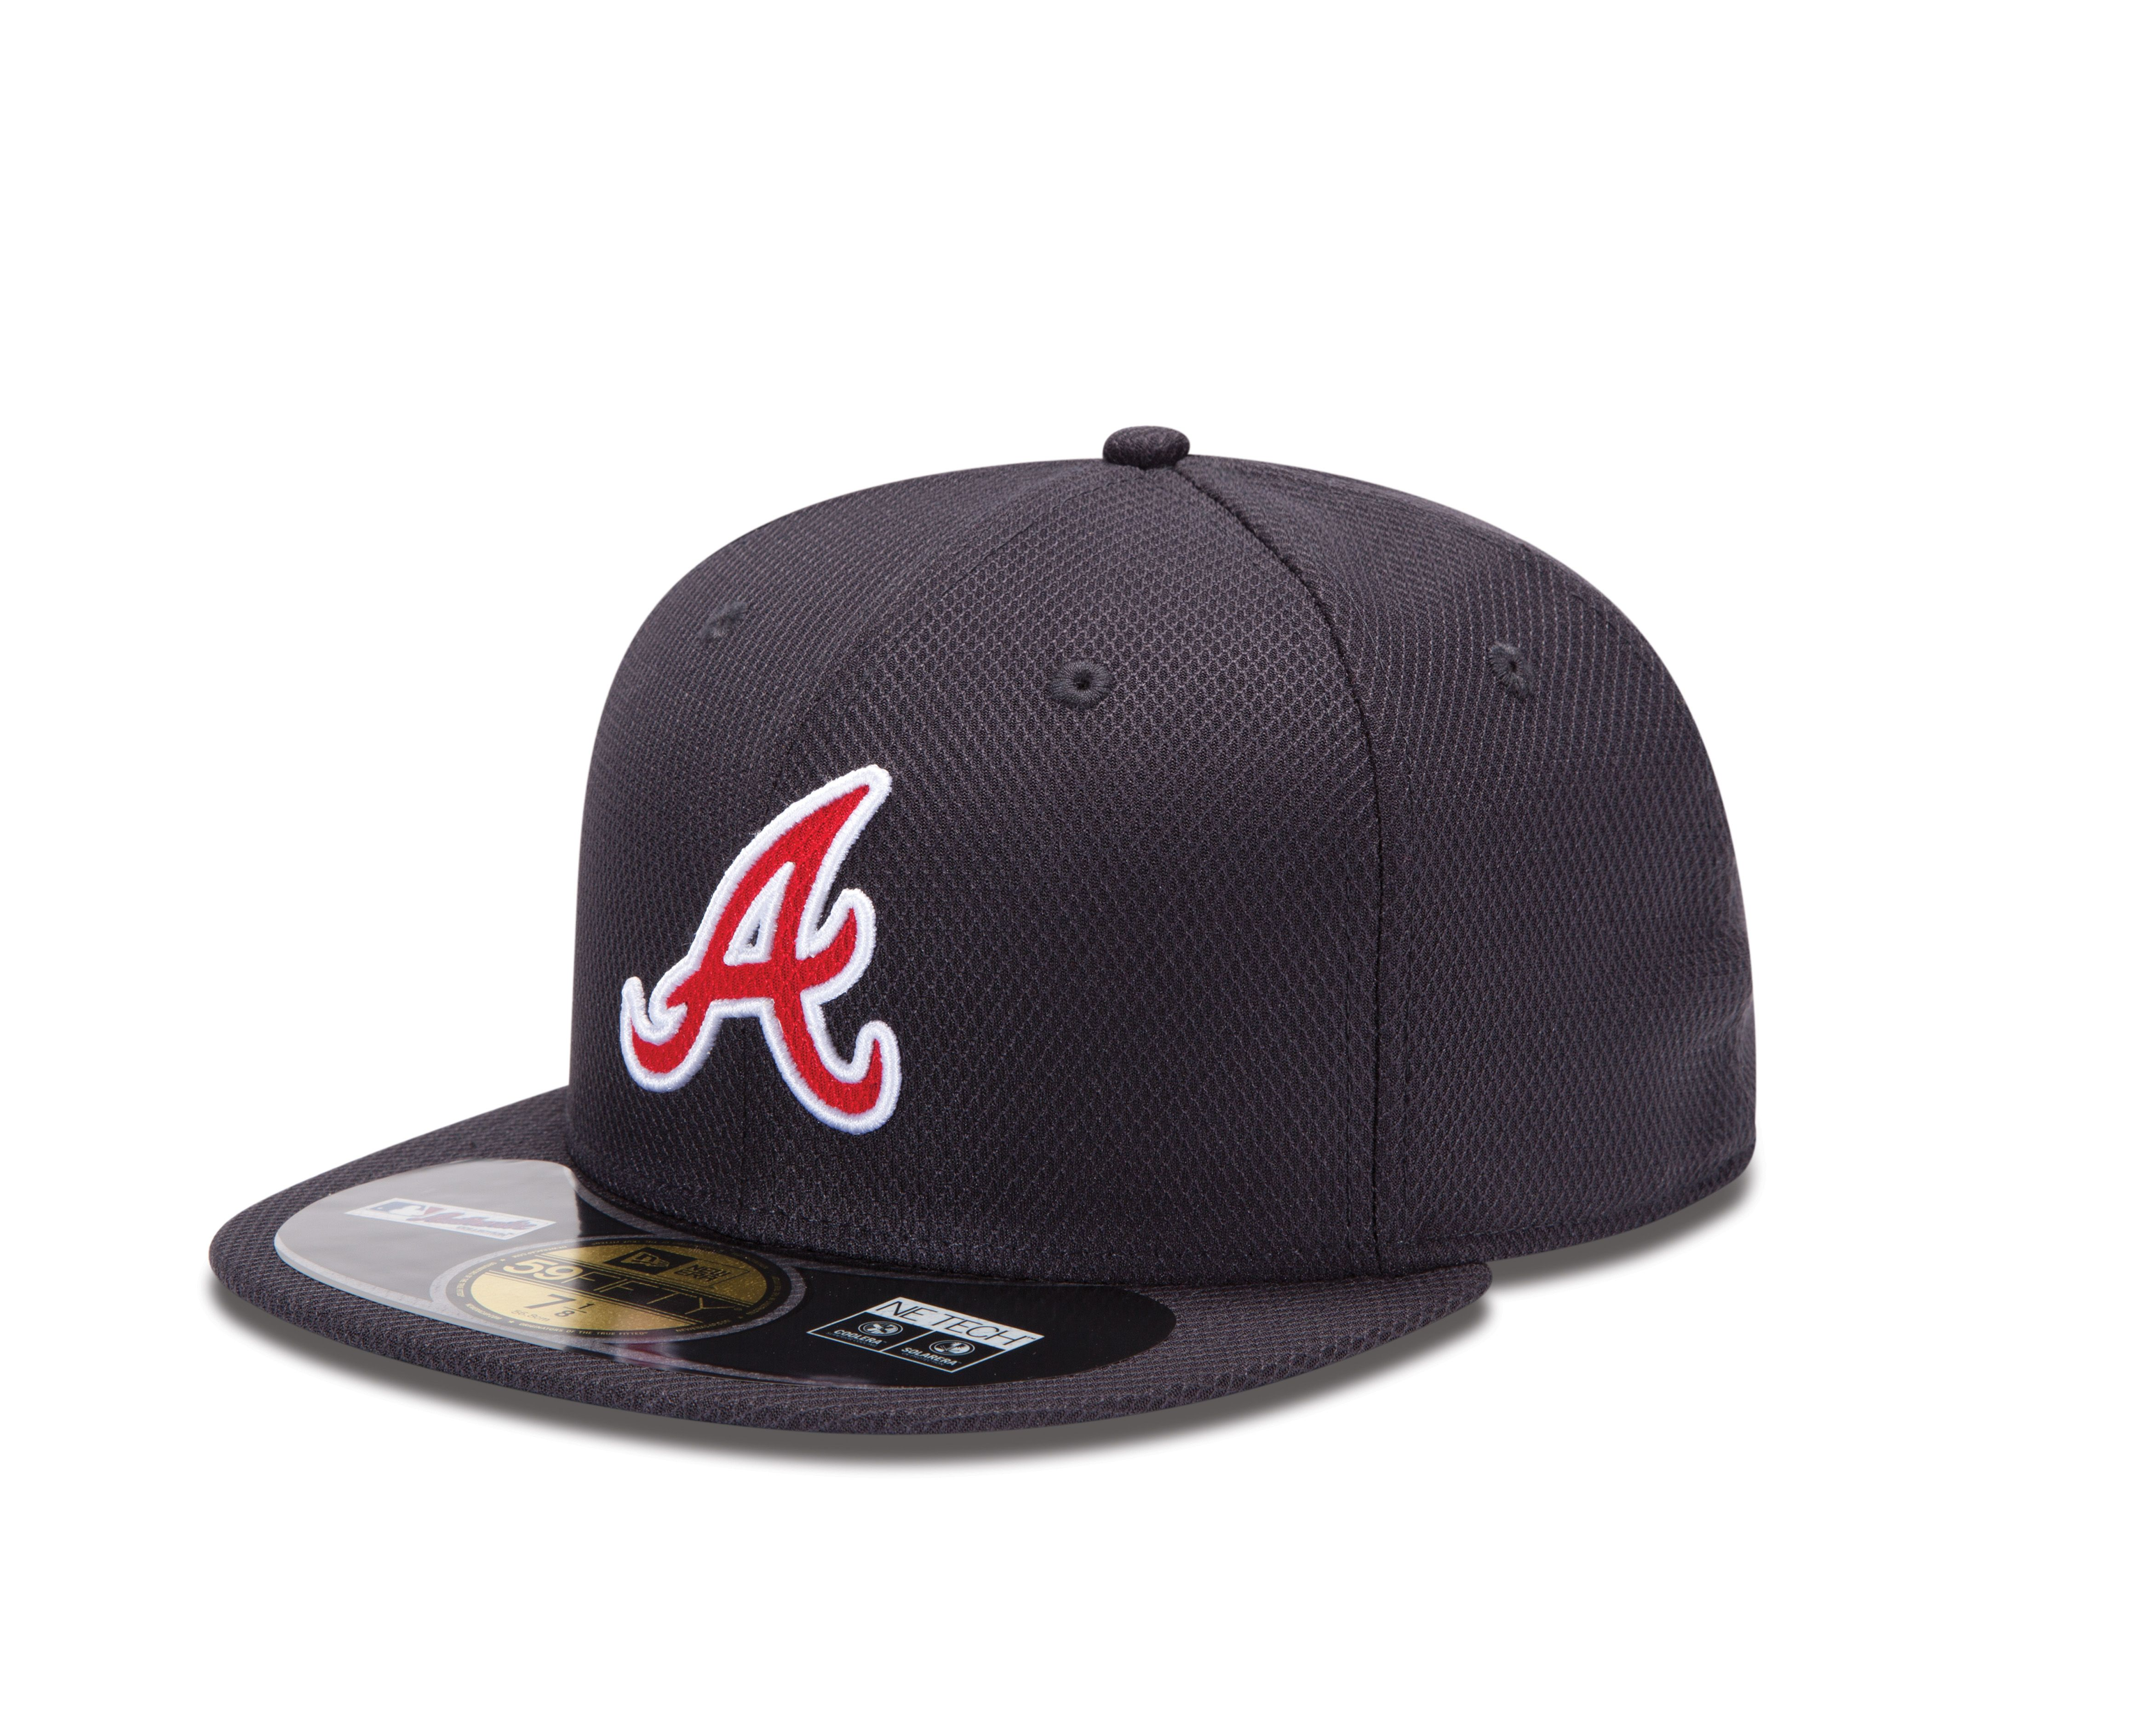 New Era Baseball Hats   New Era Unveils New Major League Baseball Hat Line  For Spring